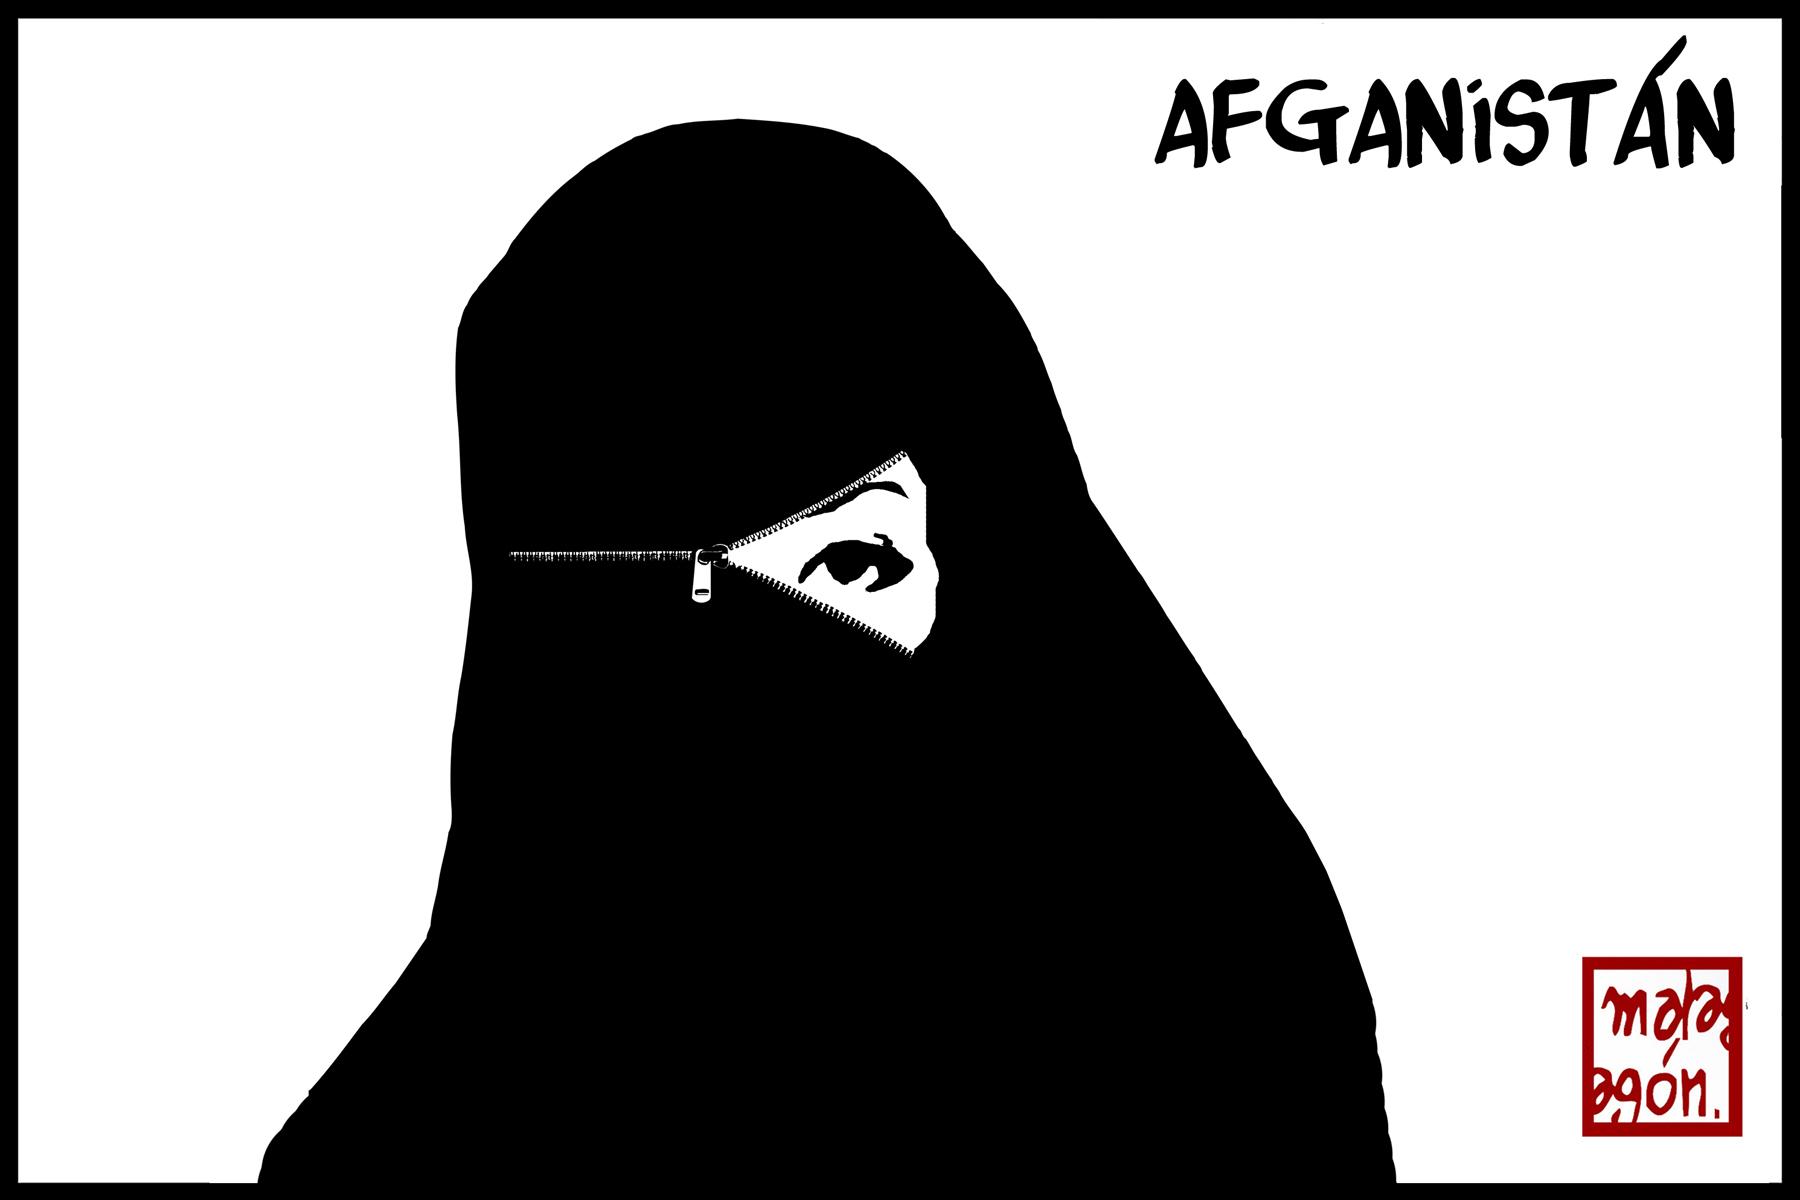 <p>Afganistán.</p>